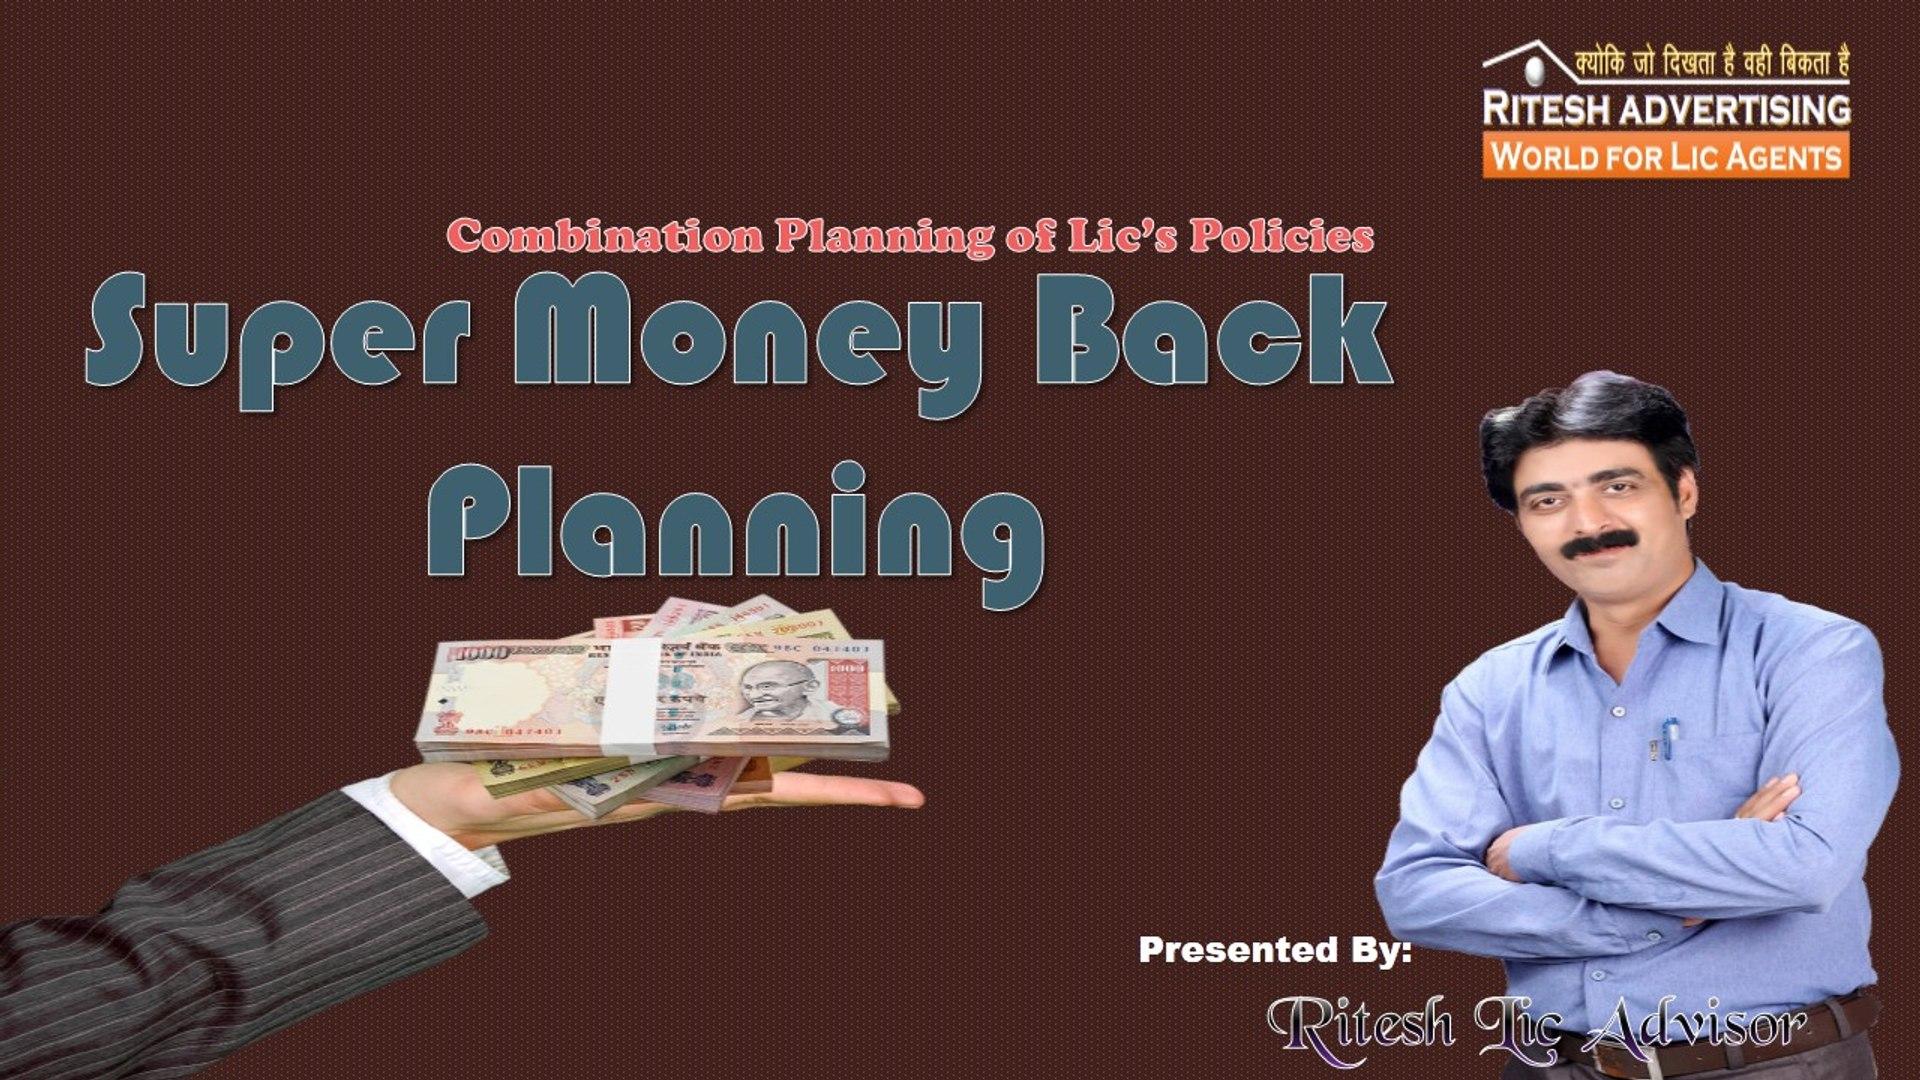 Super Money Back Planning By: Ritesh Lic Advisor